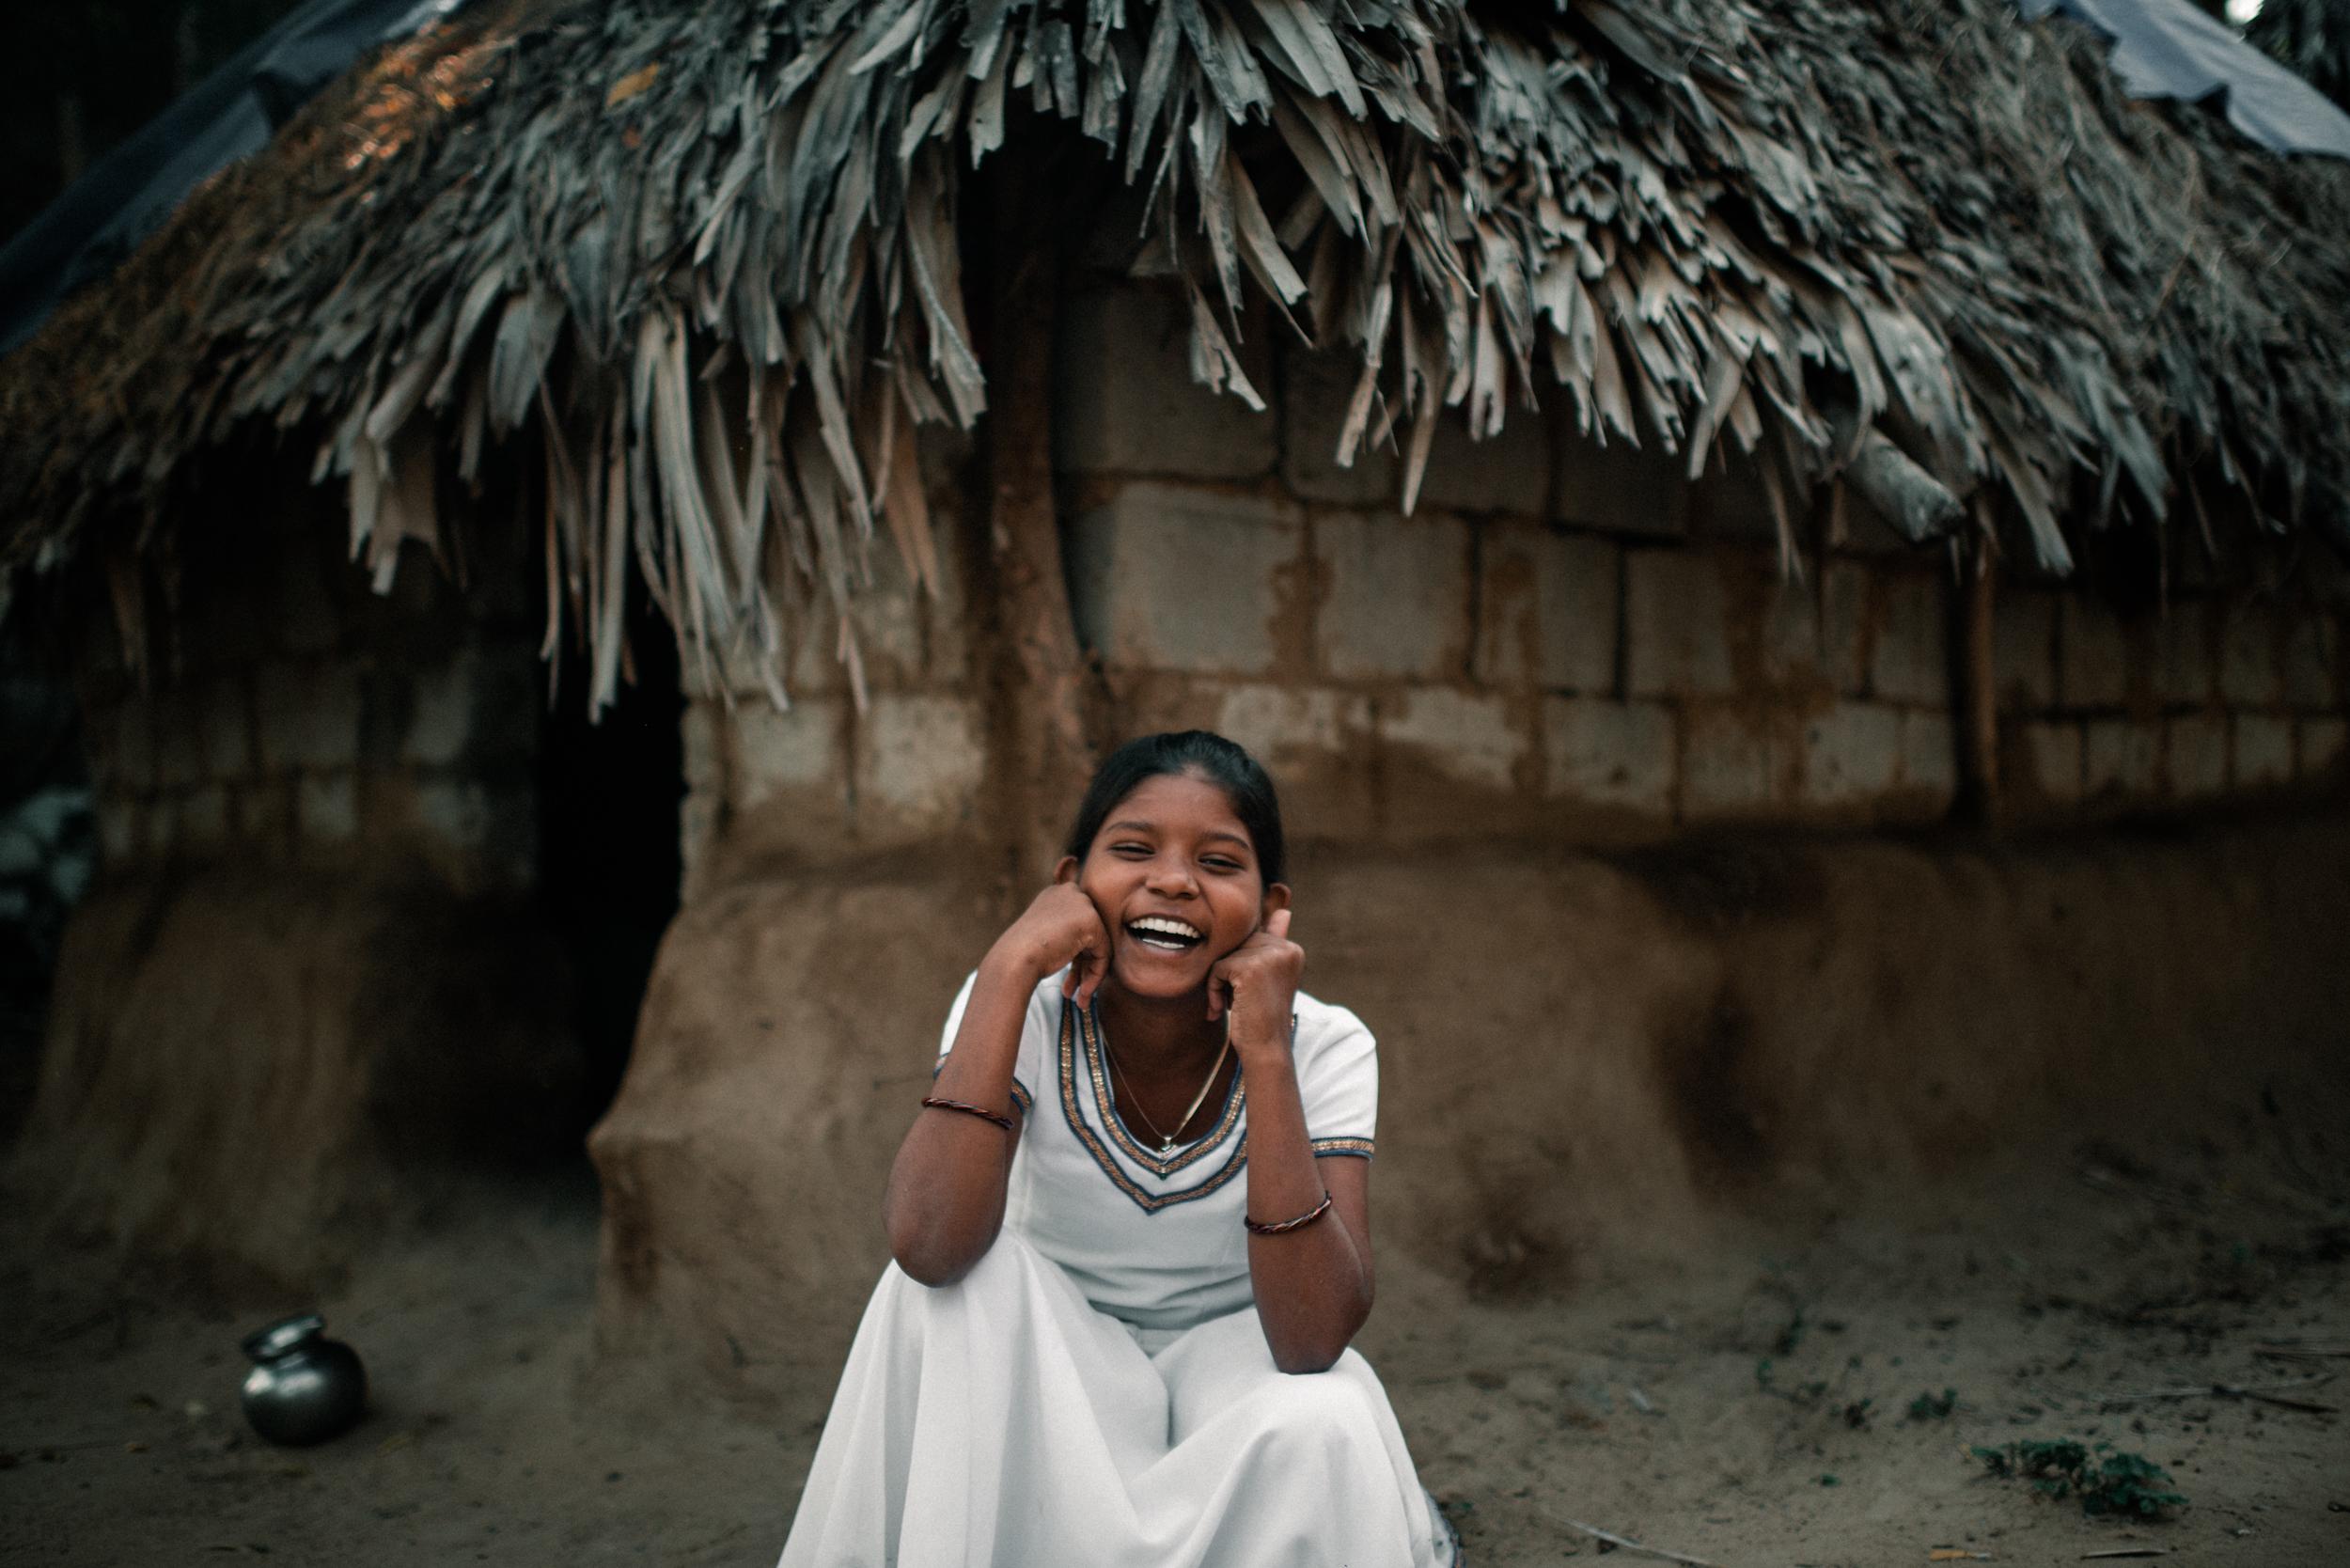 CCH_INDIA_HUMANITARIAN_NGO_TaraShupe_Photography_DSC_7526.jpg